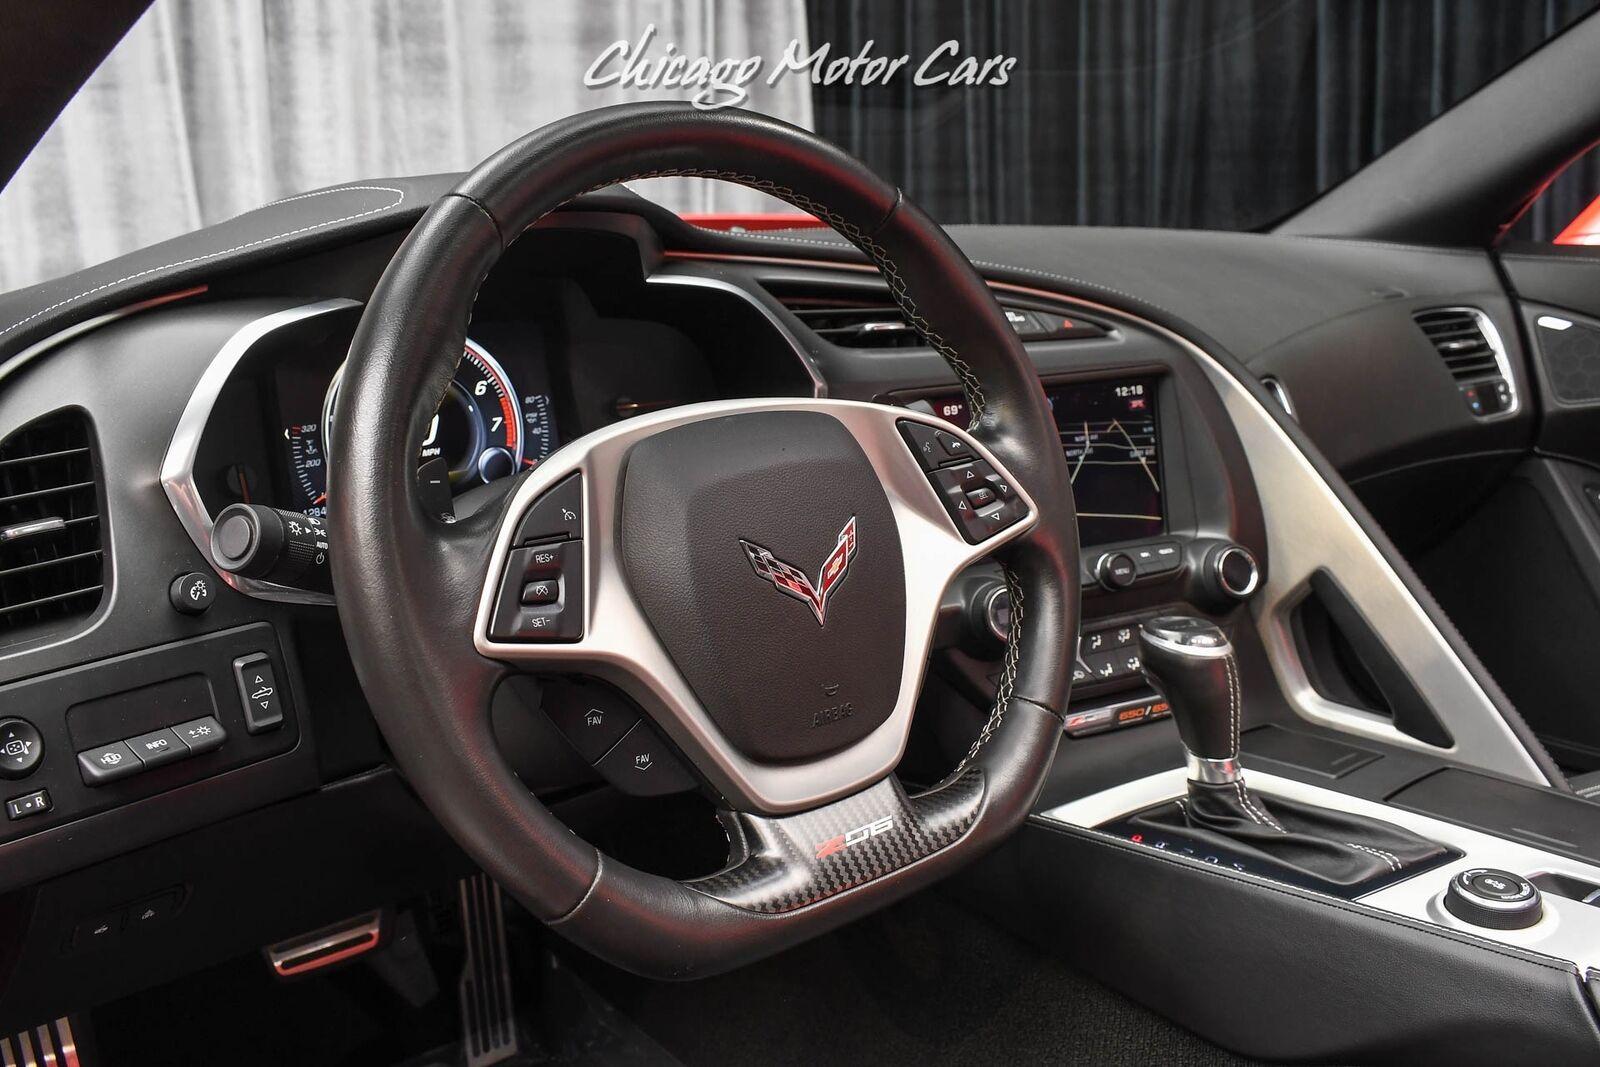 2015 Red Chevrolet Corvette Z06 2LZ | C7 Corvette Photo 10